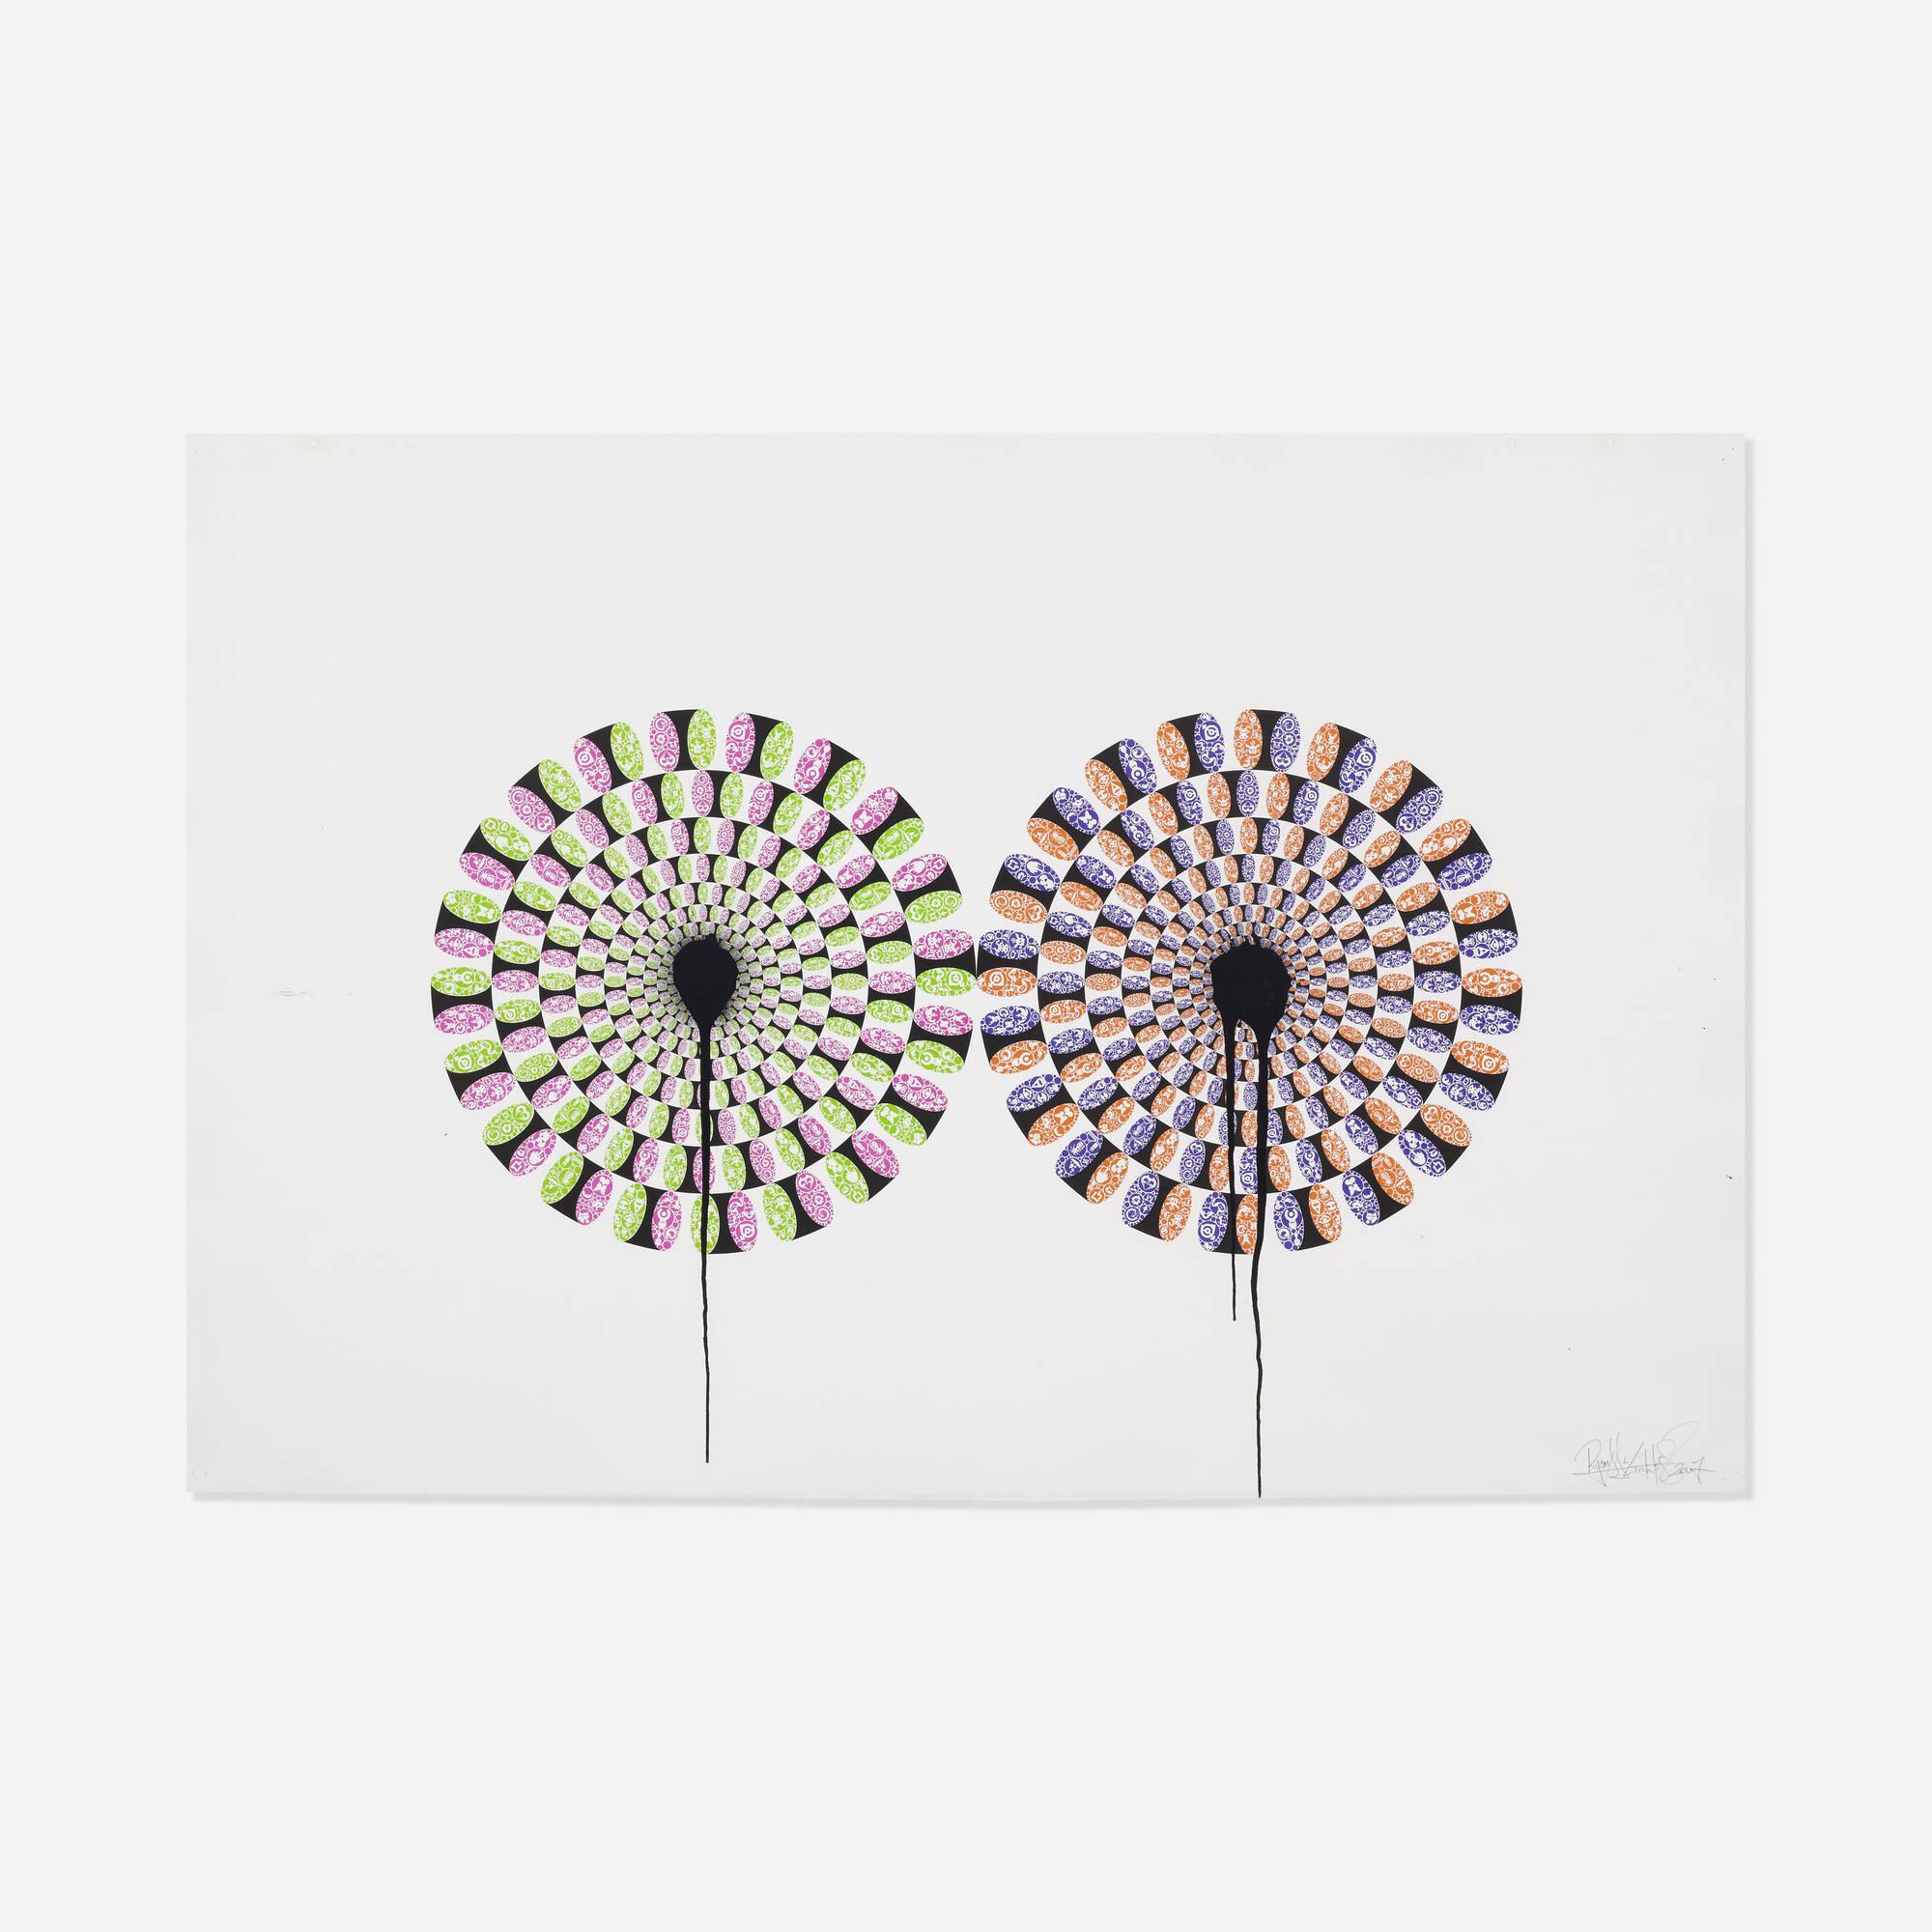 111: Ryan McGinness / Kaleiding Petals (Peripheral Drift Illusion) (1 of 1)